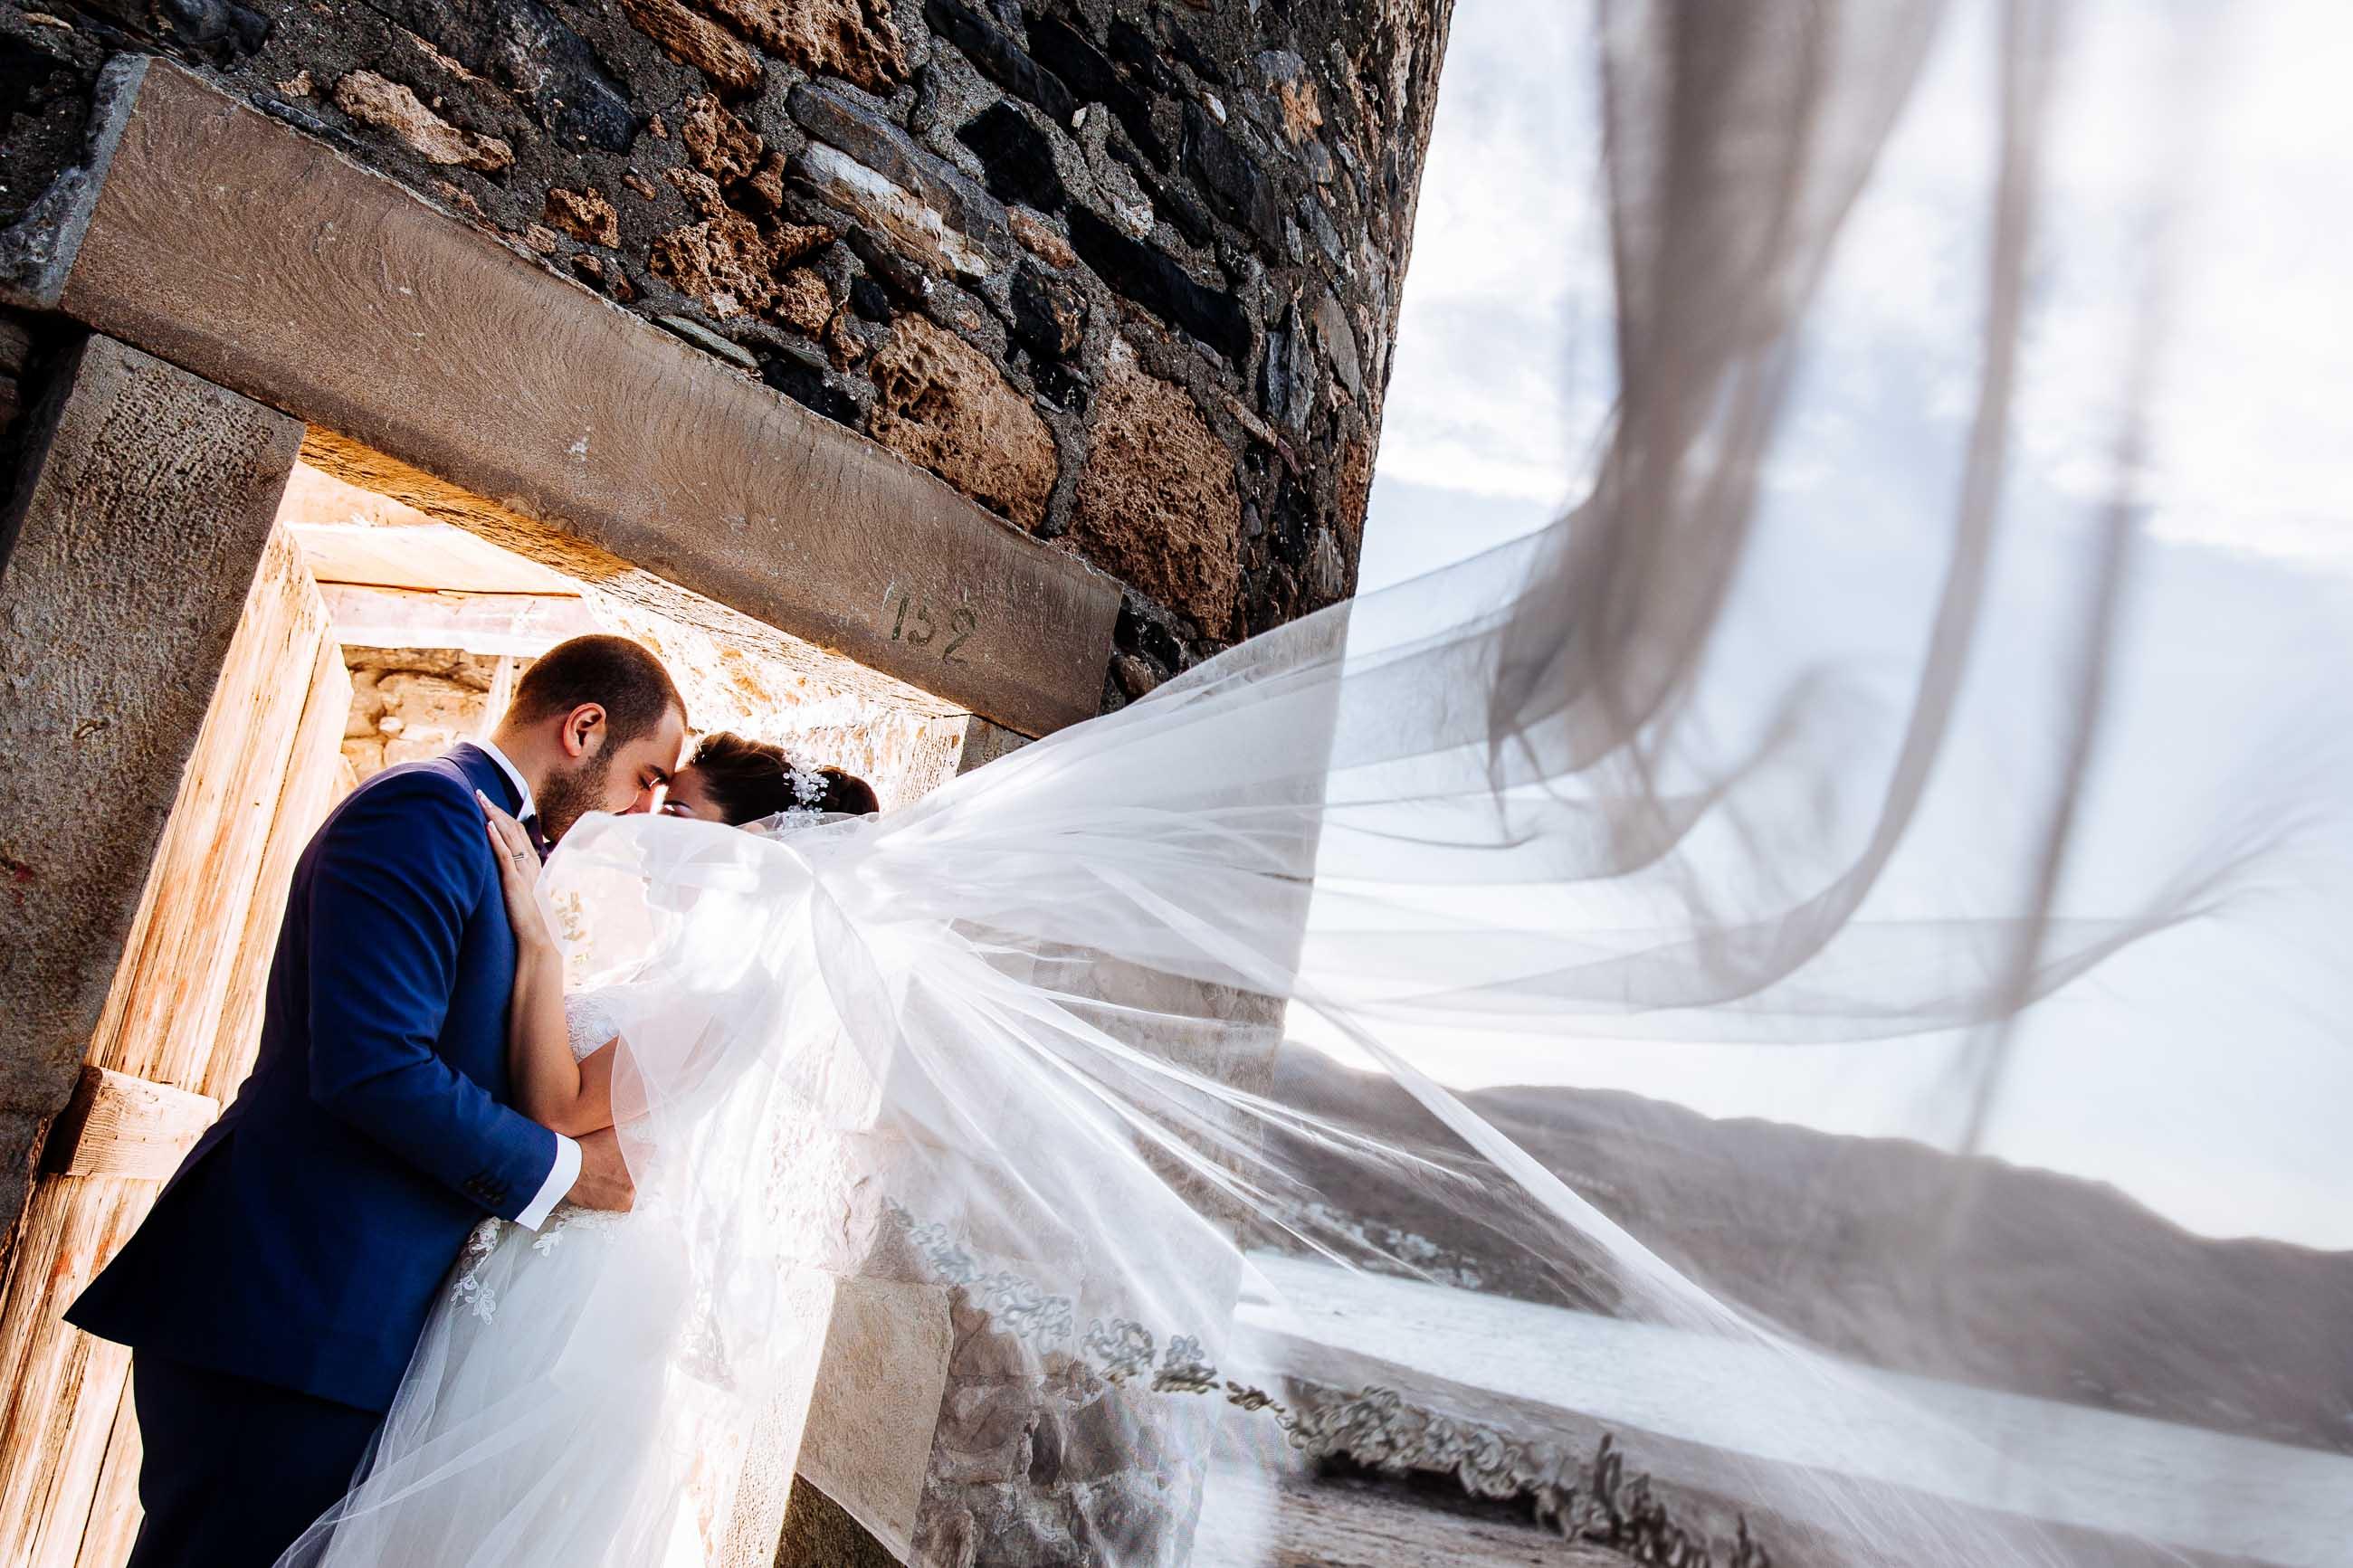 Bride and groom, veil blowing in the wind